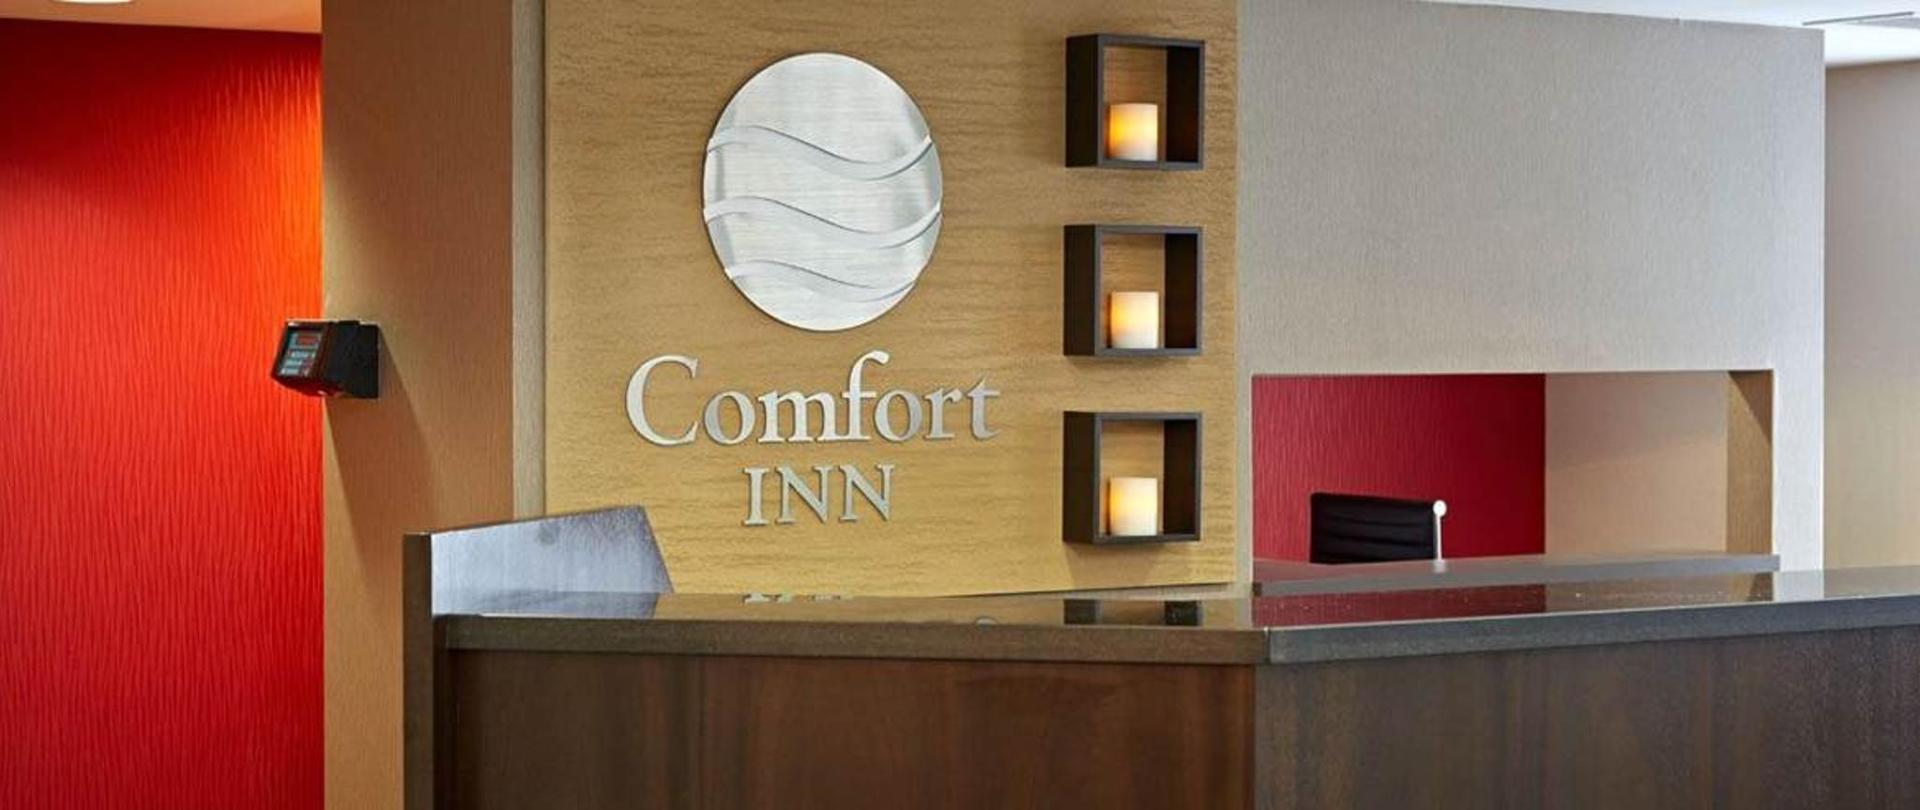 Comfort Inn Belleville   Belleville   Ontario   Canada.jpg